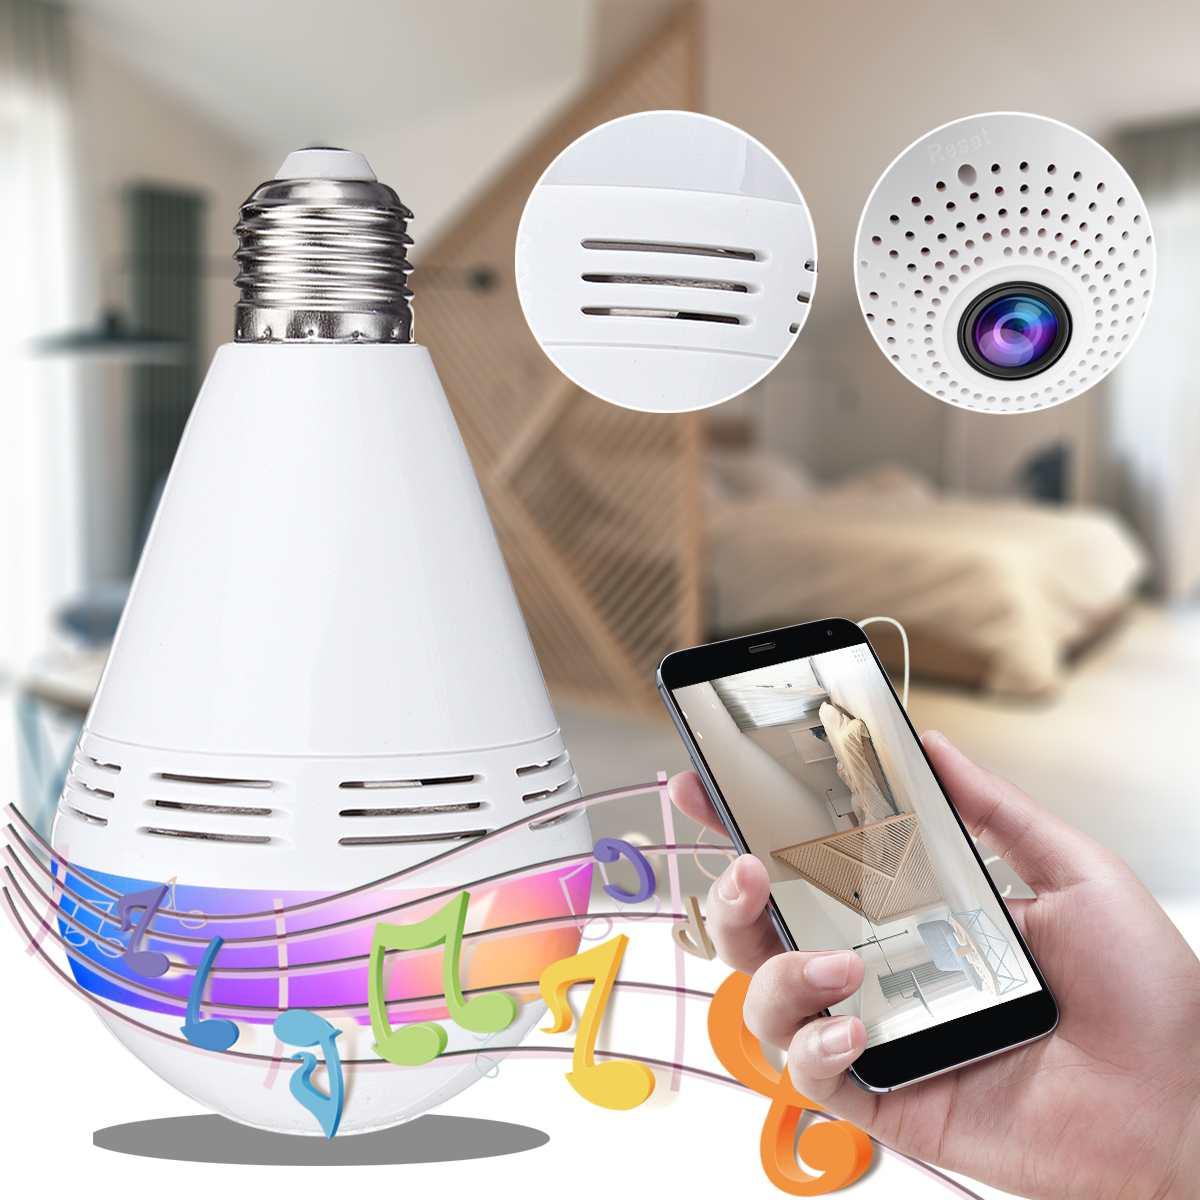 E27 Wireless bluetooth Speaker Bulb Music Playing Dimmable LED Lamp Light Bulb IP Camera Wifi FishEye CCTV Home Security Camera